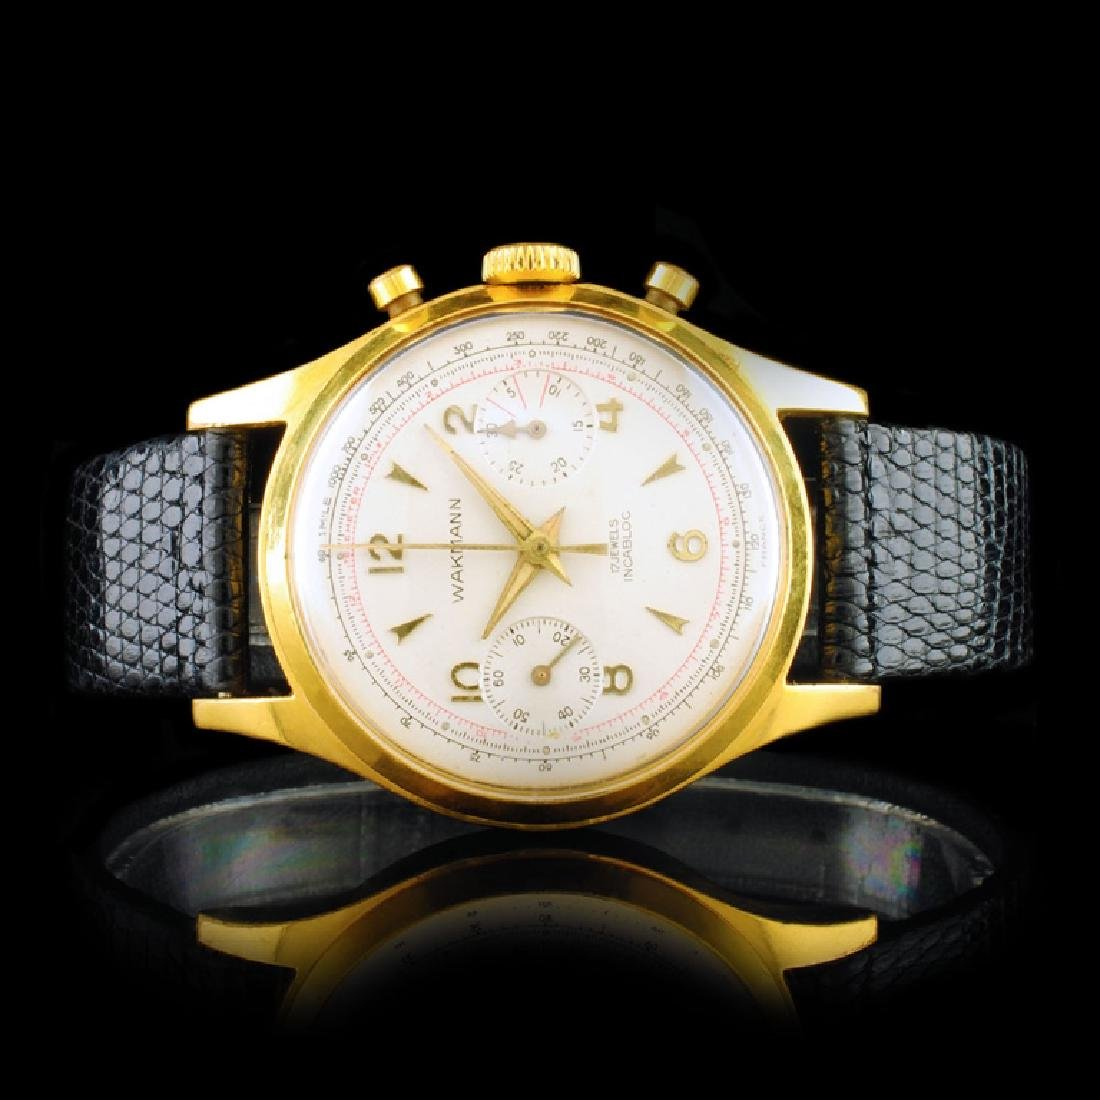 WAKMANN Suisse 36mm Chrongraph Wristwatch